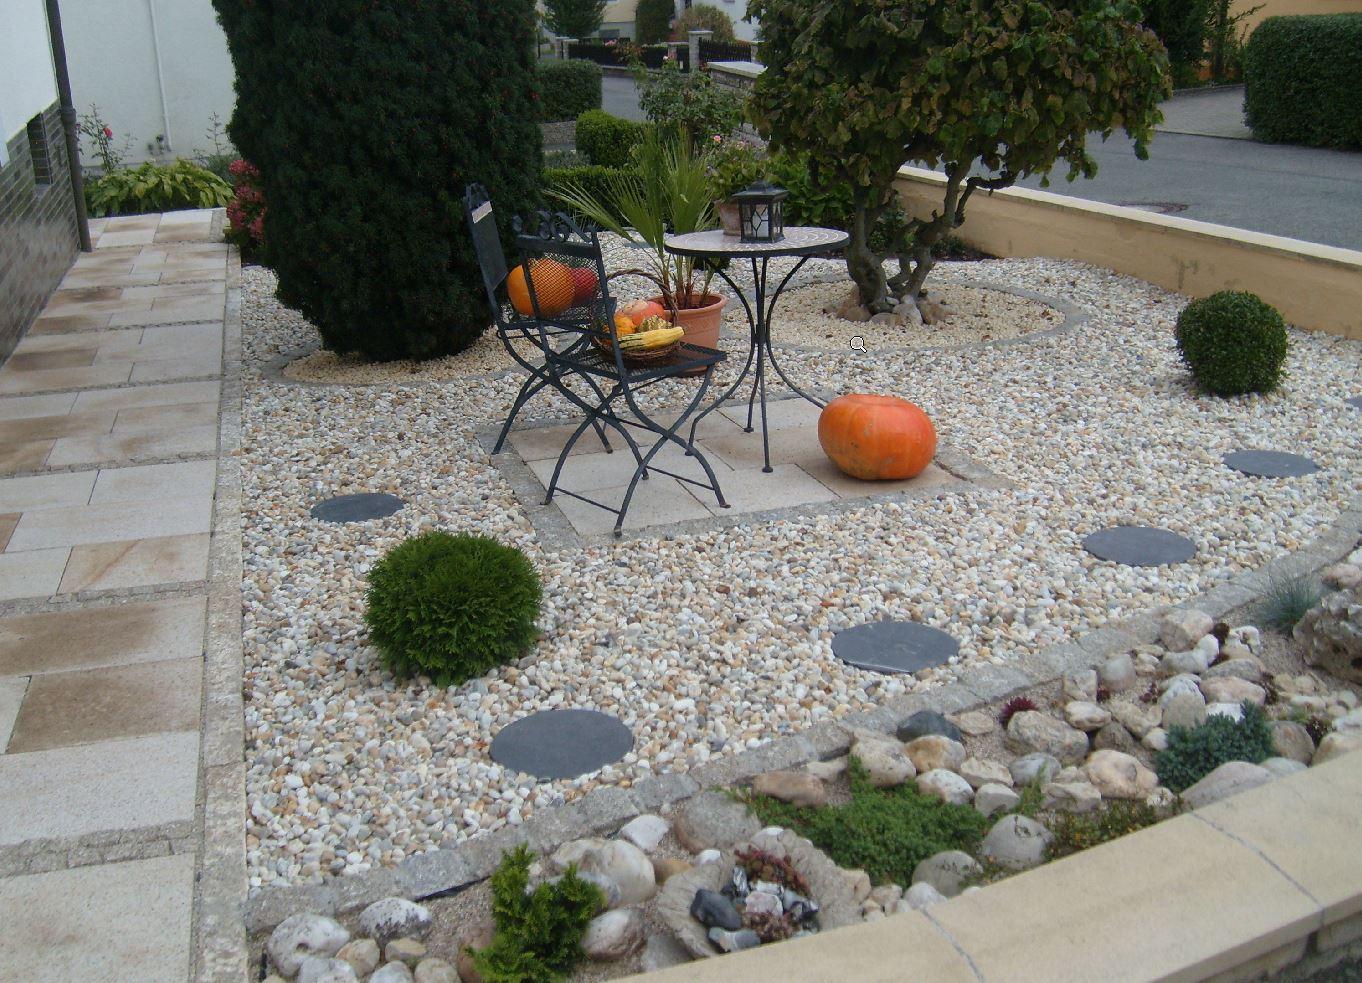 garten und landschaftsbau kreative ideen ber home design. Black Bedroom Furniture Sets. Home Design Ideas